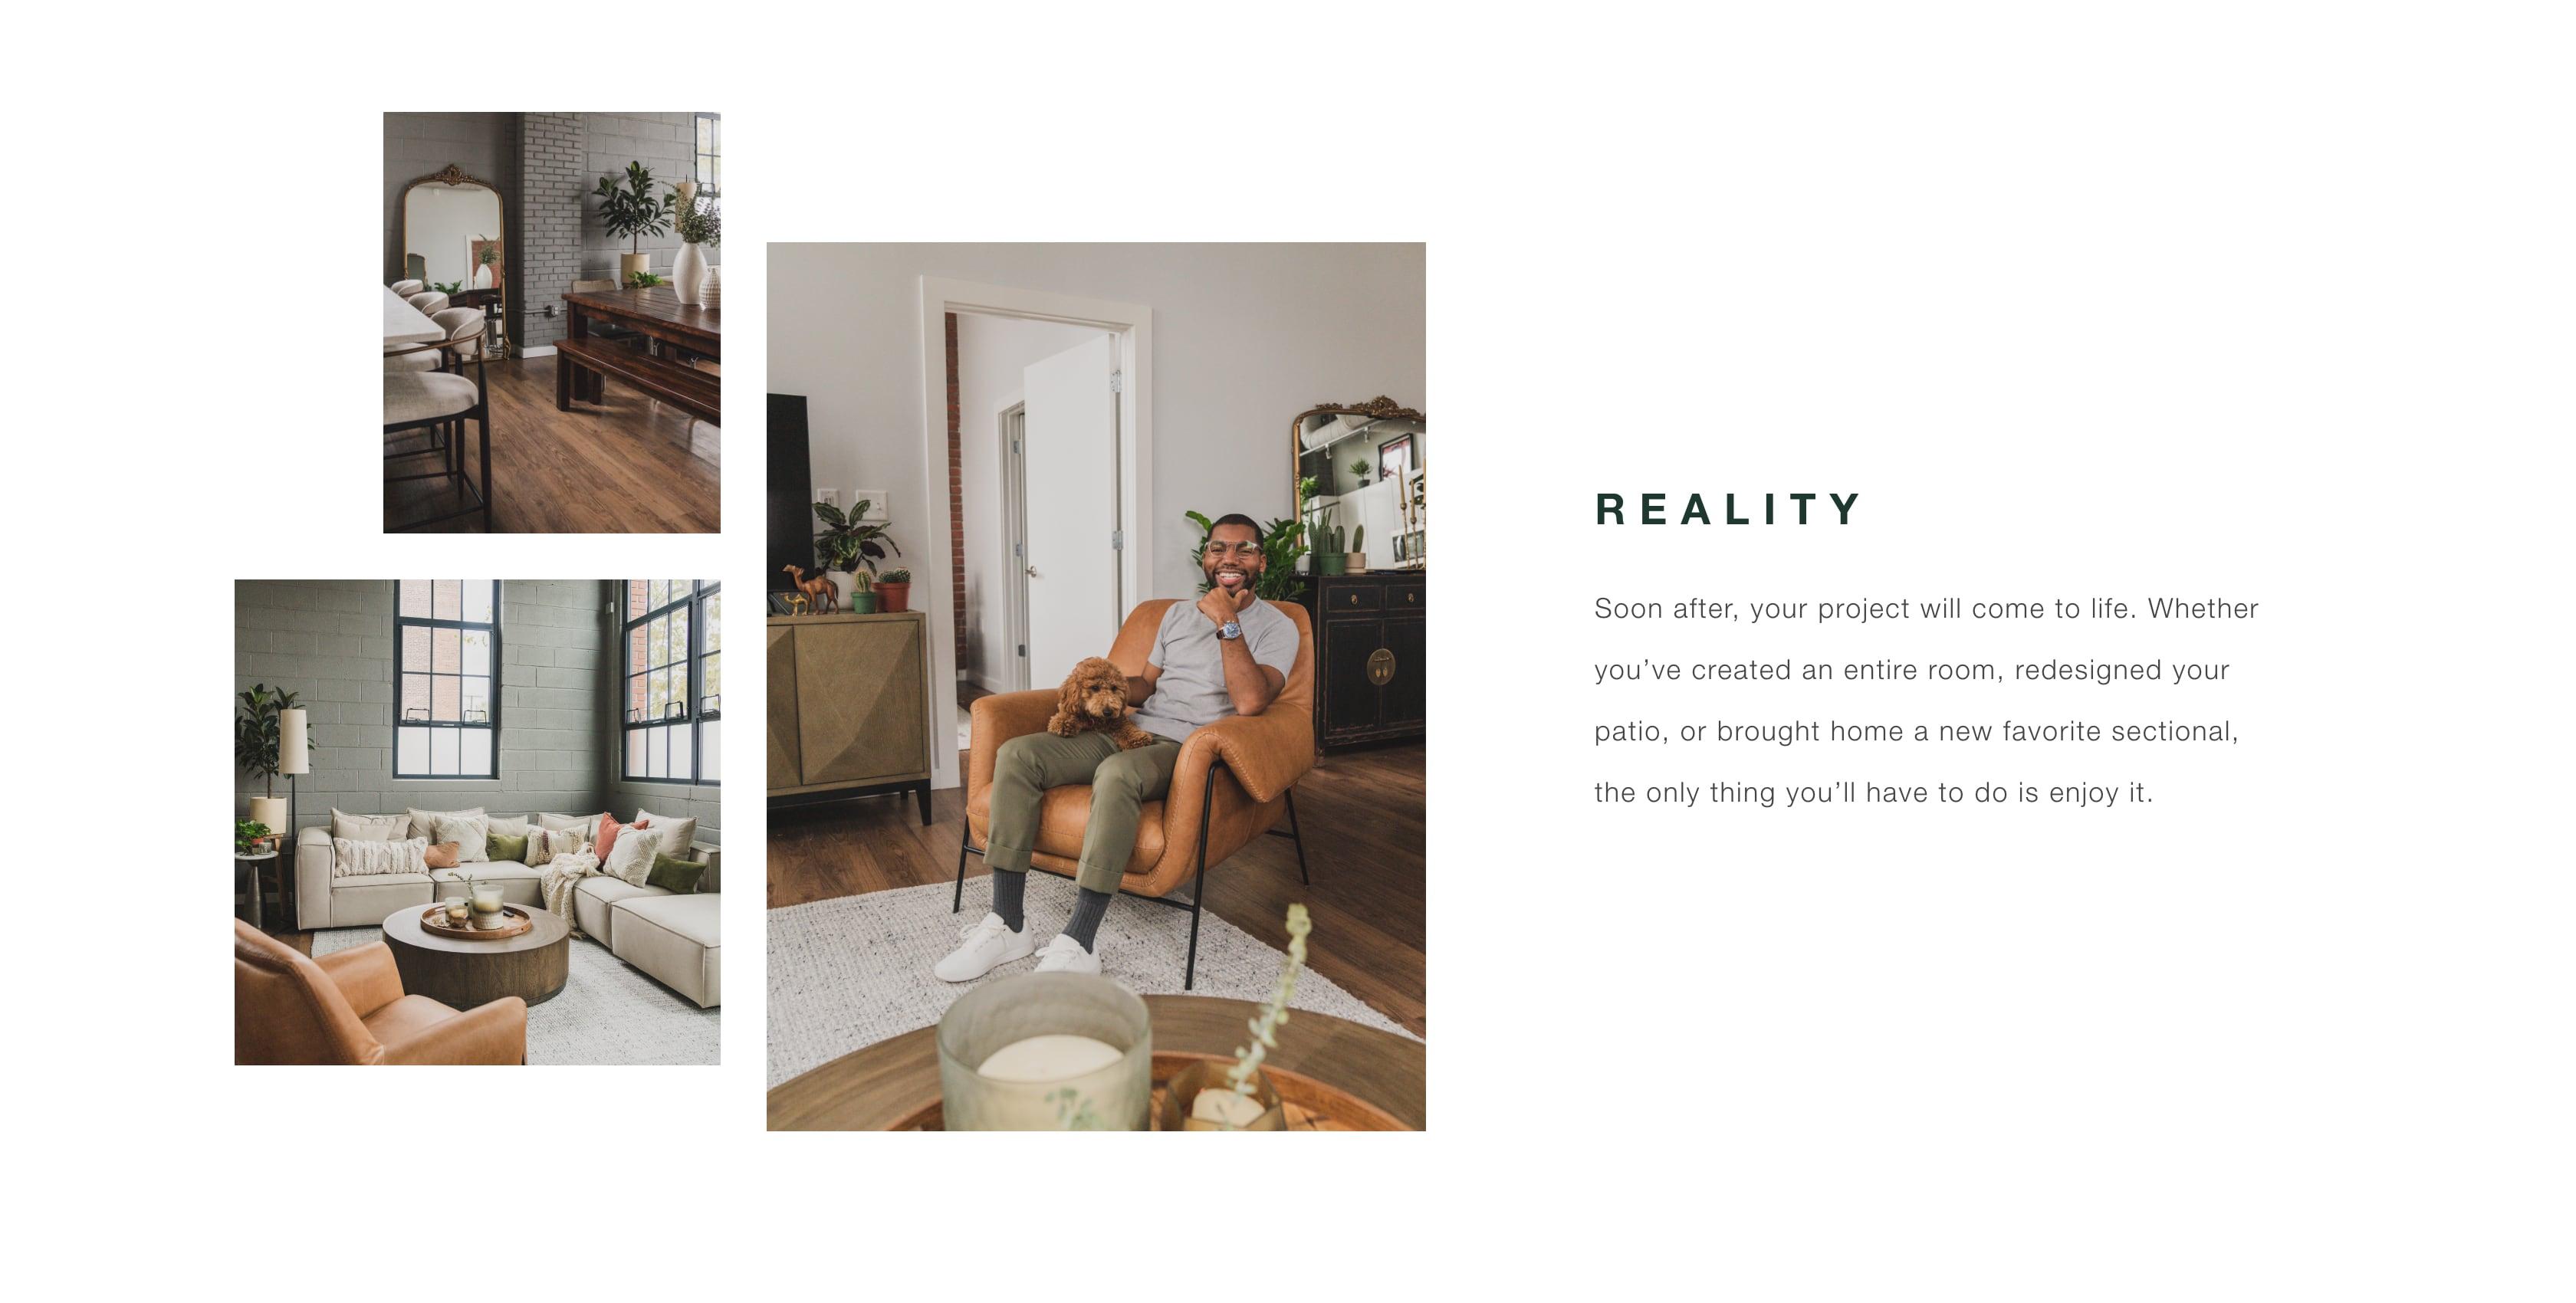 Reality - Enjoy Your Custom Space